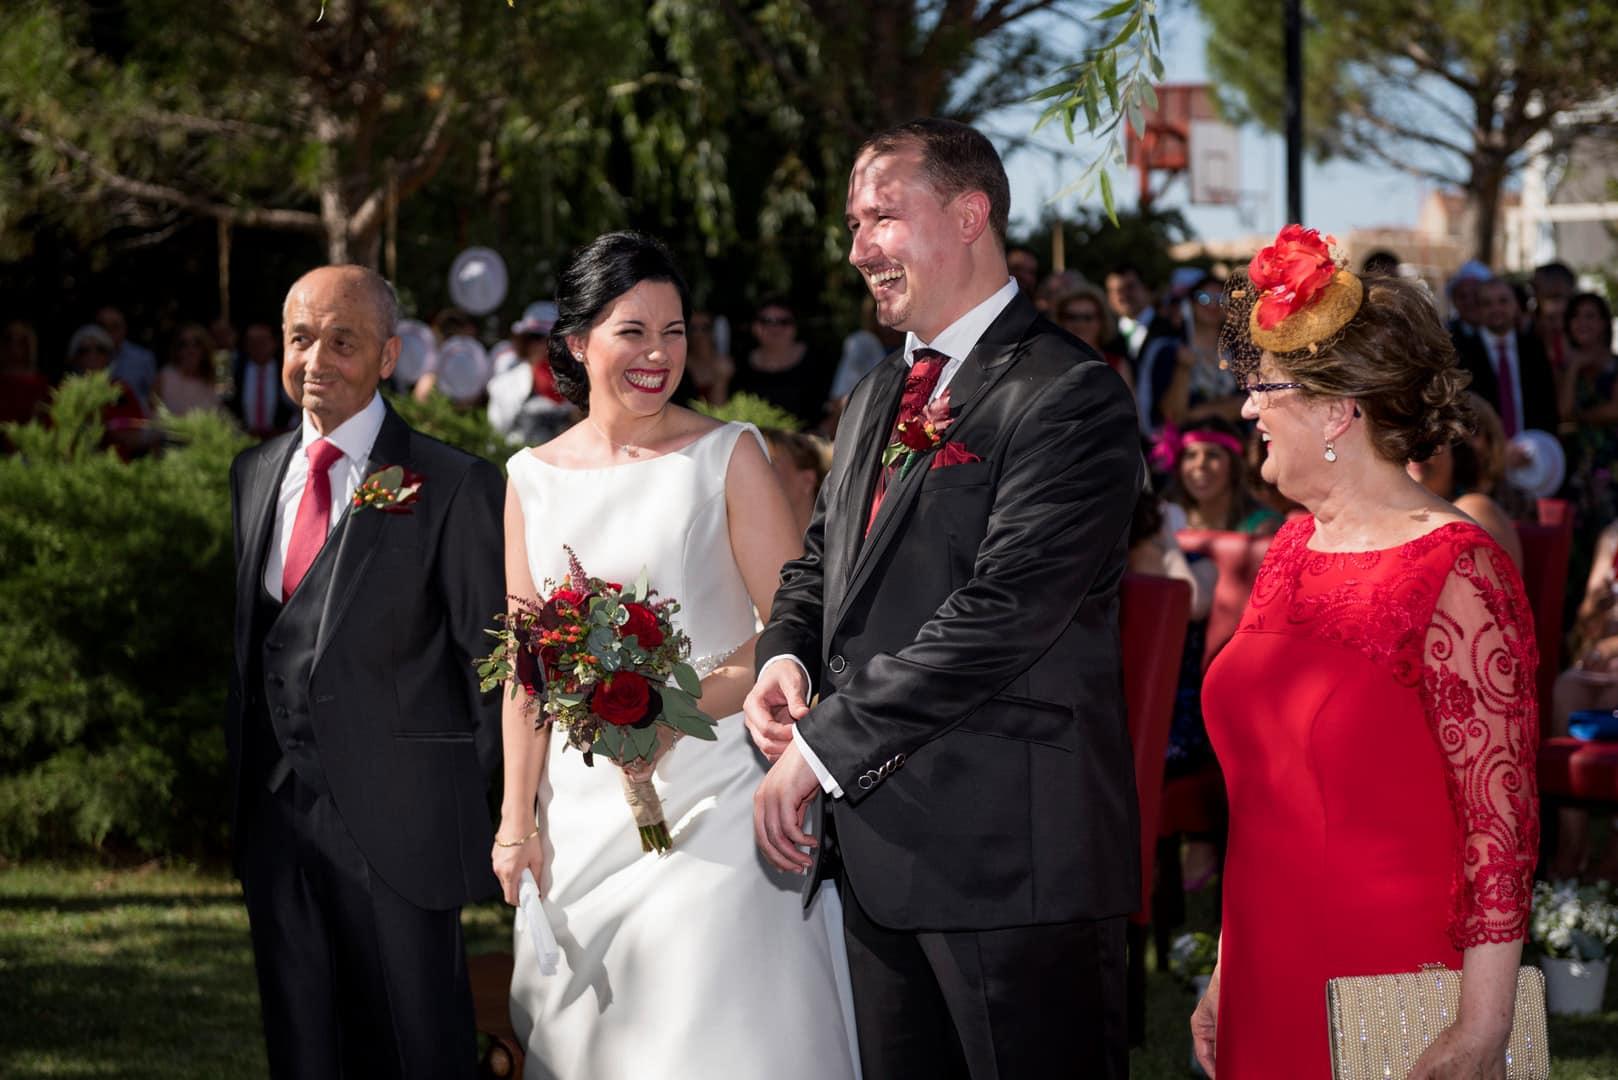 risas ZAZU-boda-divertida-en-rojo-Segovia UNA BODA DIVERTIDA EN SEGOVIA